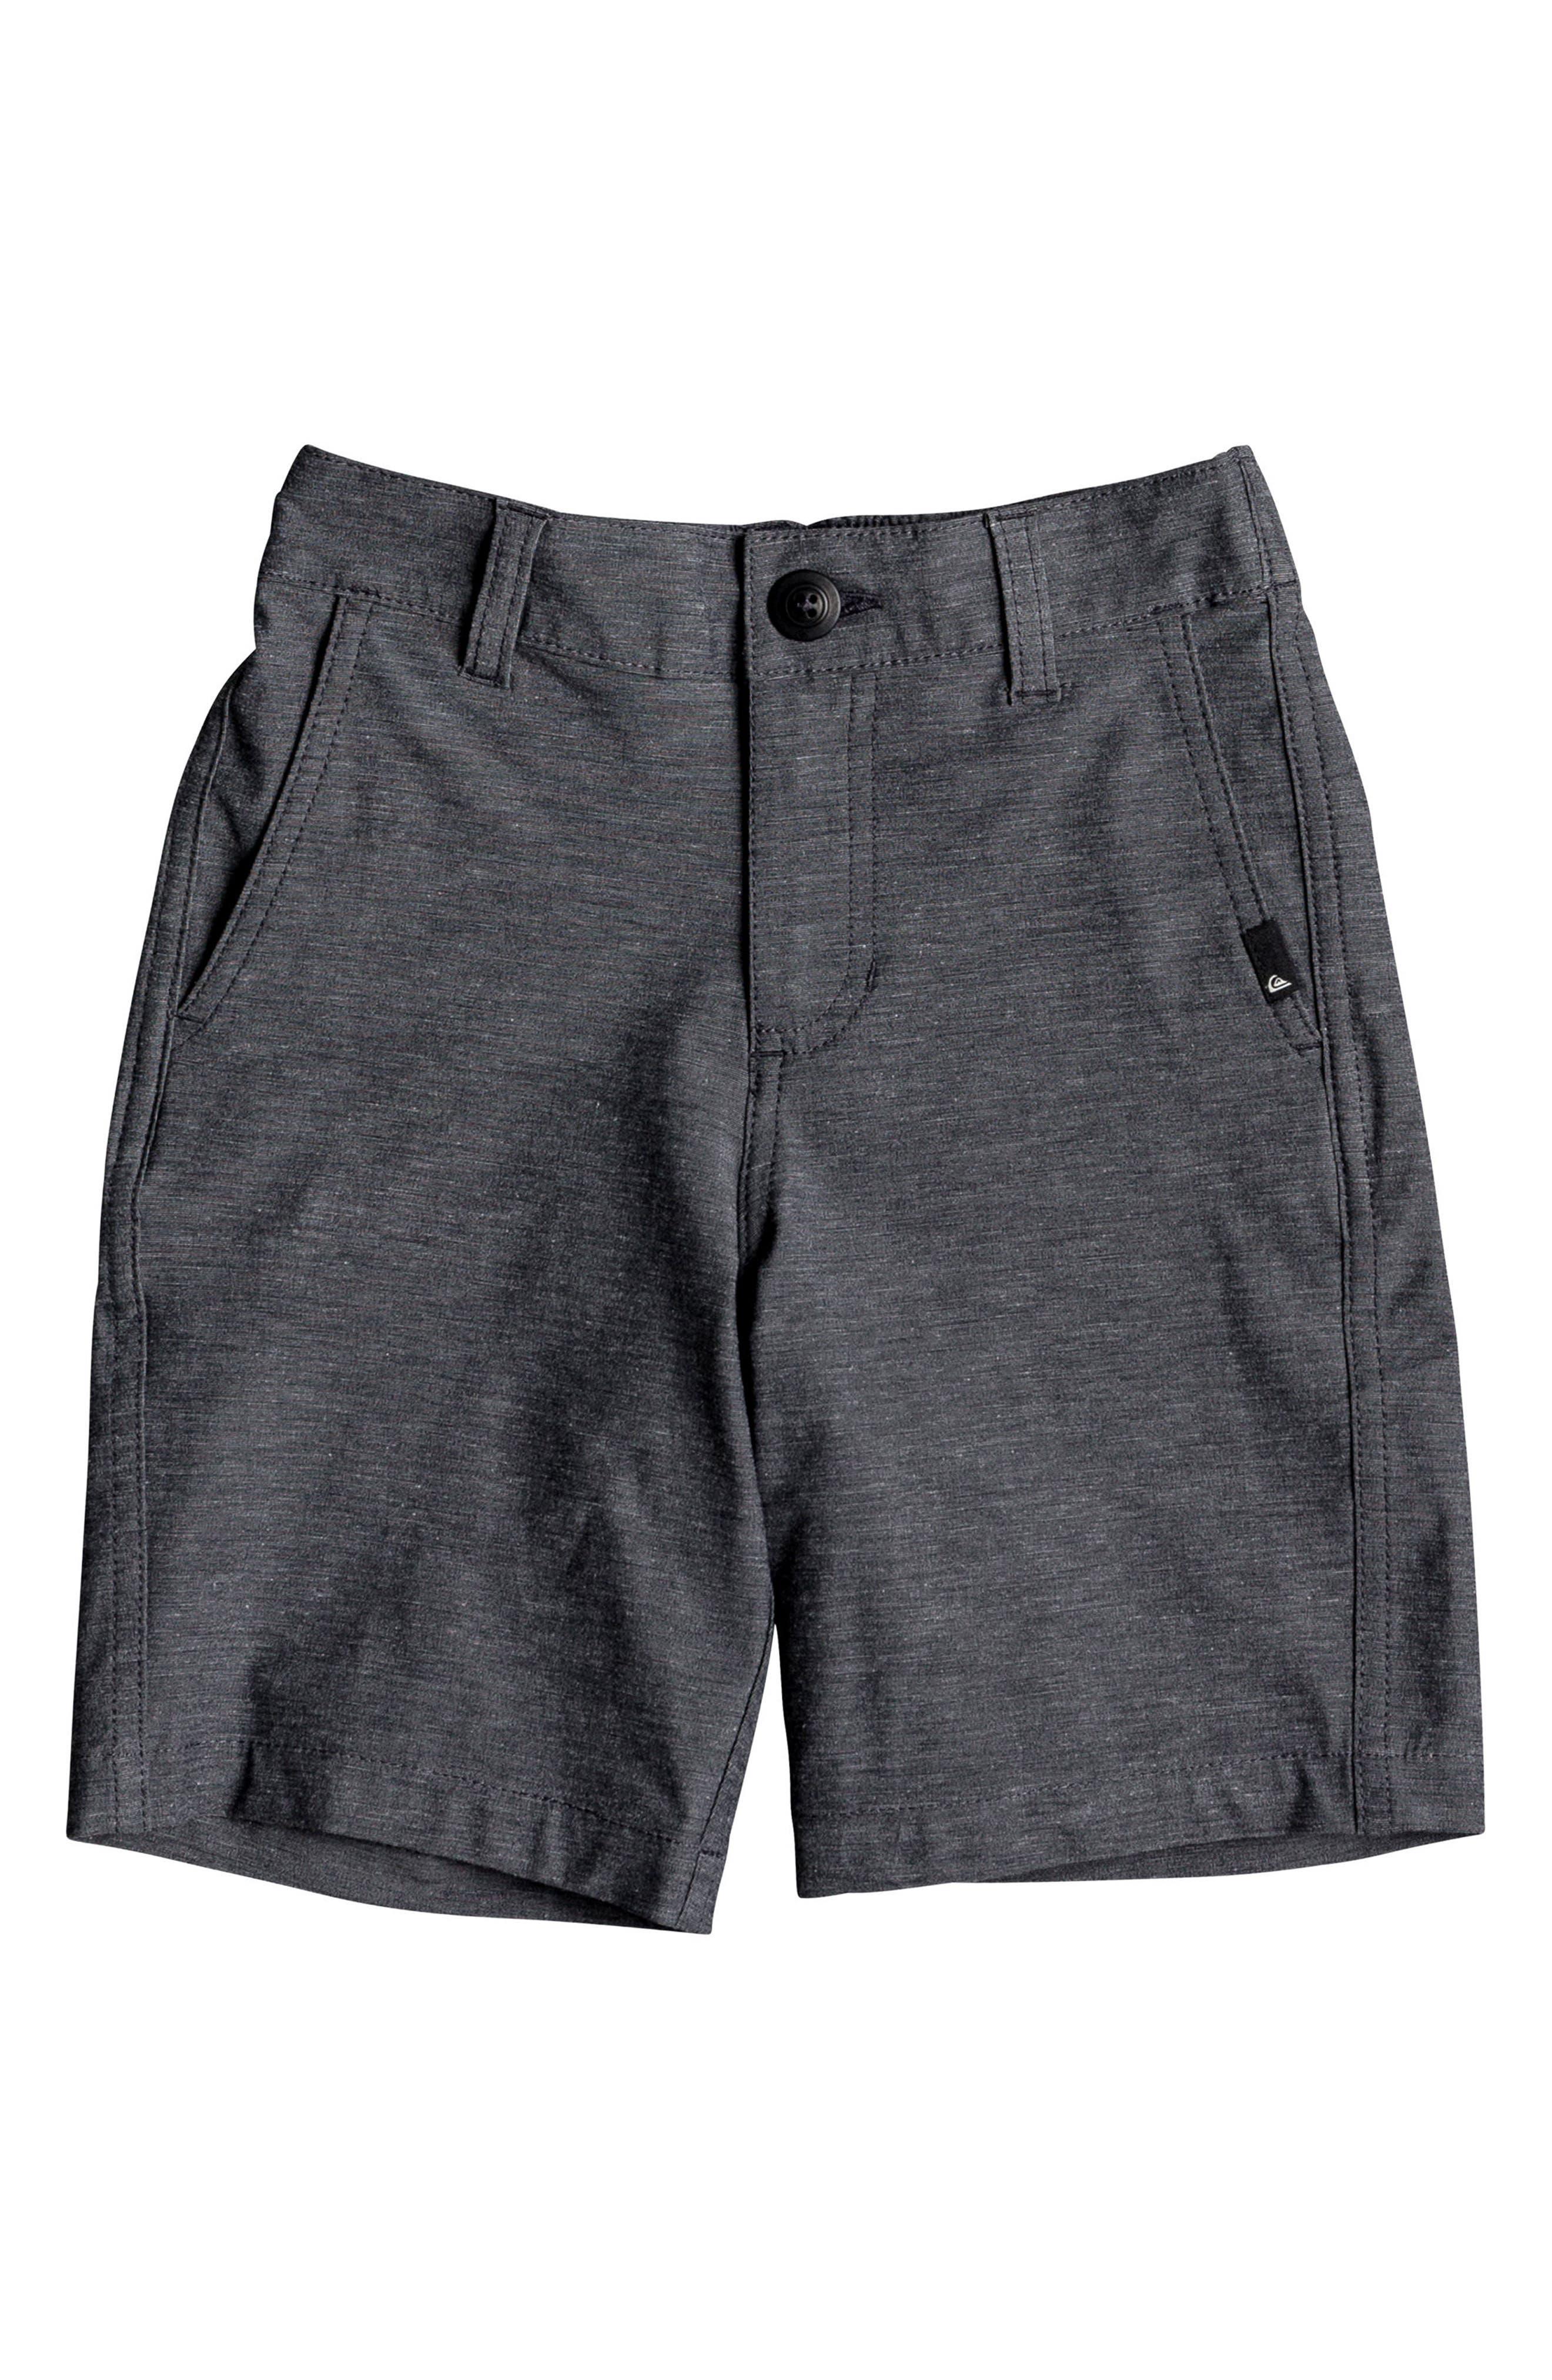 Union Heather Amphibian Board Shorts,                             Main thumbnail 1, color,                             Black